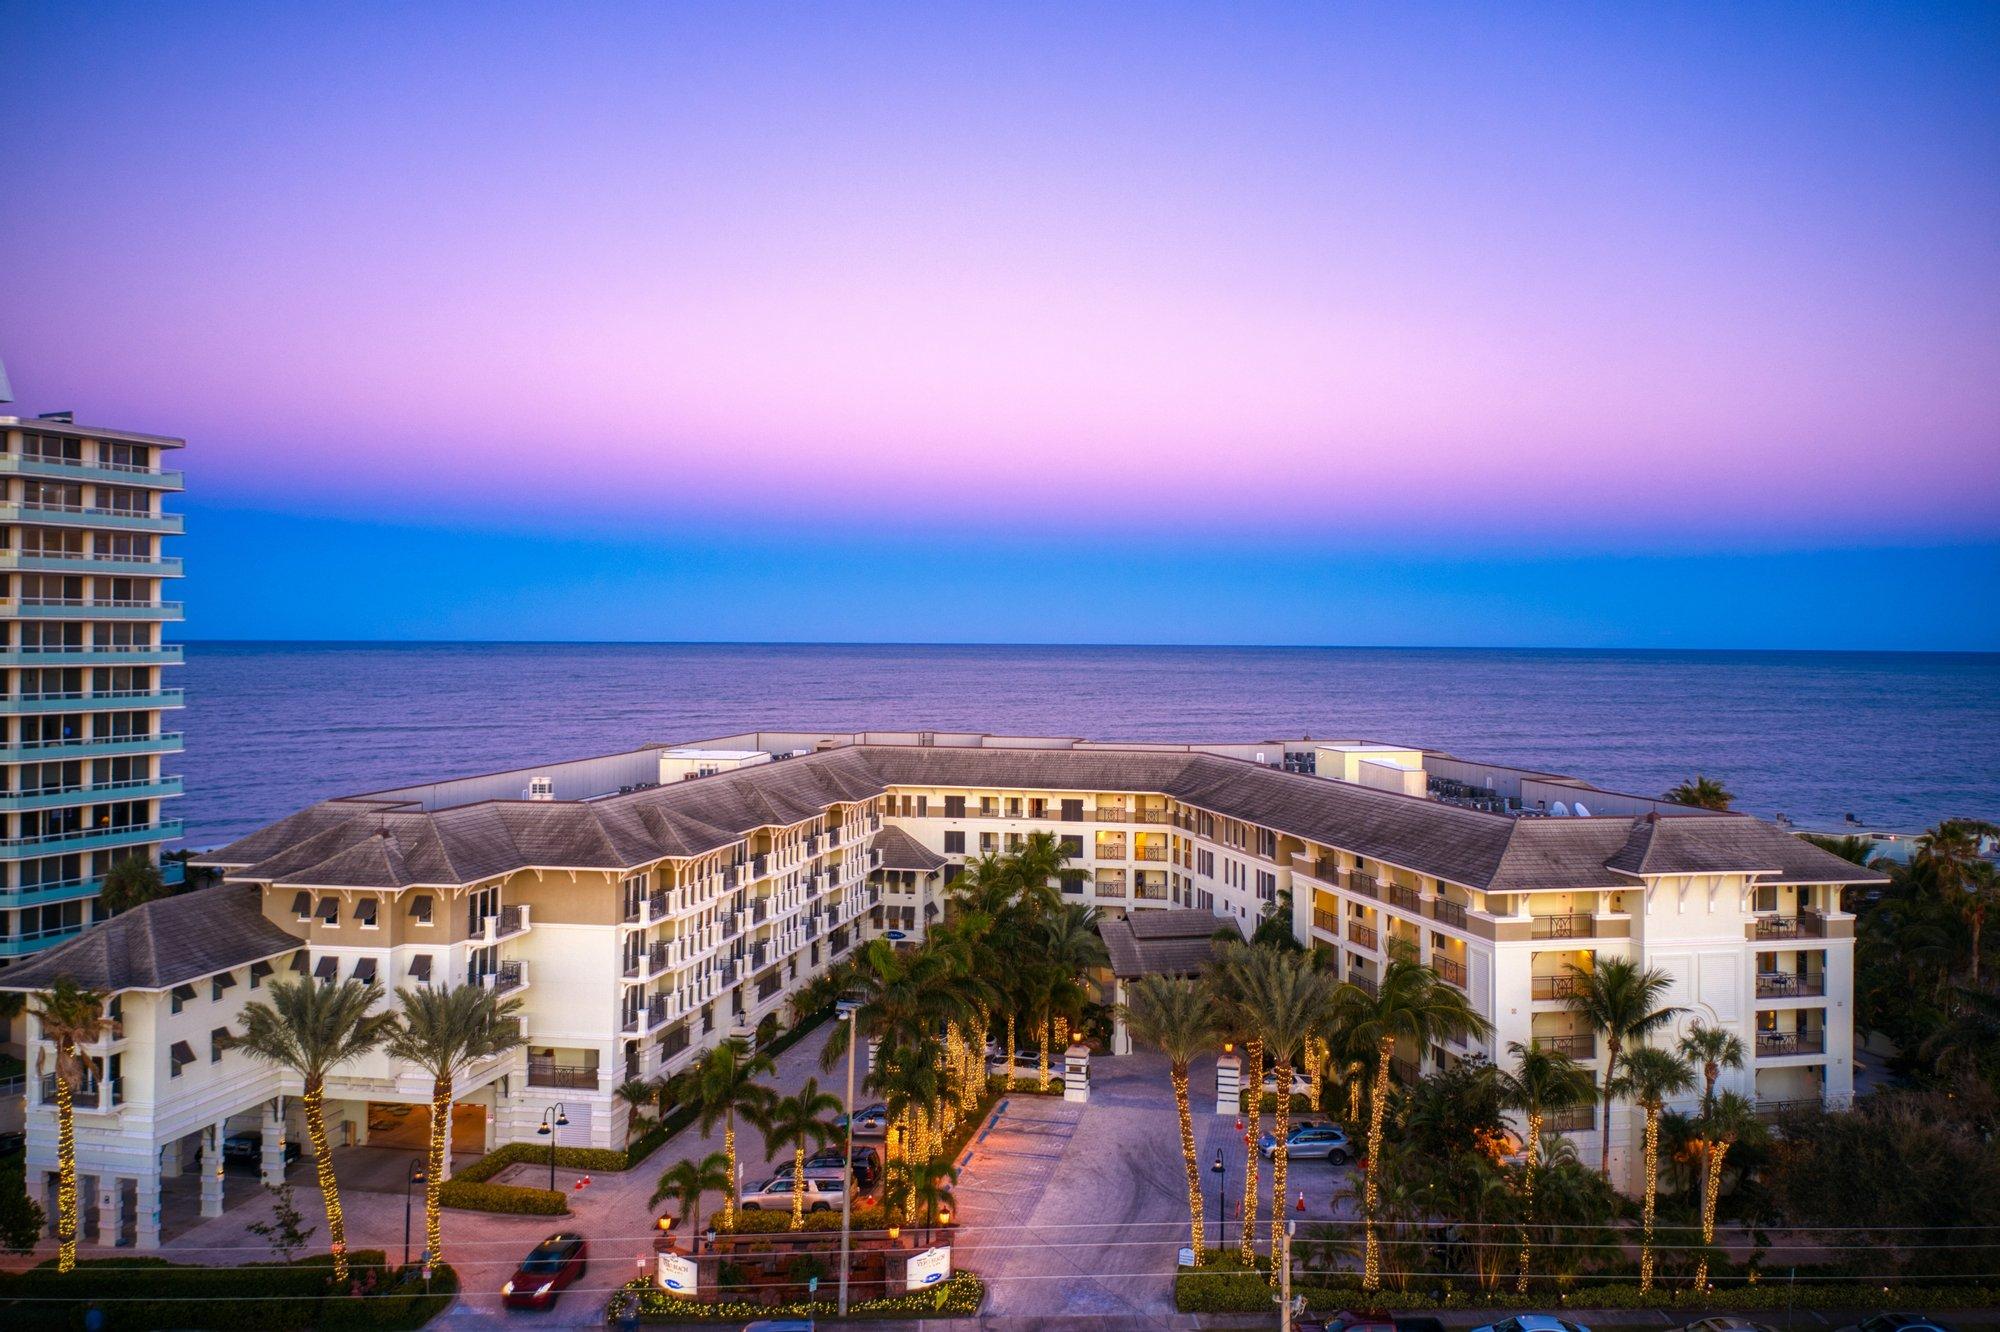 Vero Beach, Florida, United States 1 - 10831157